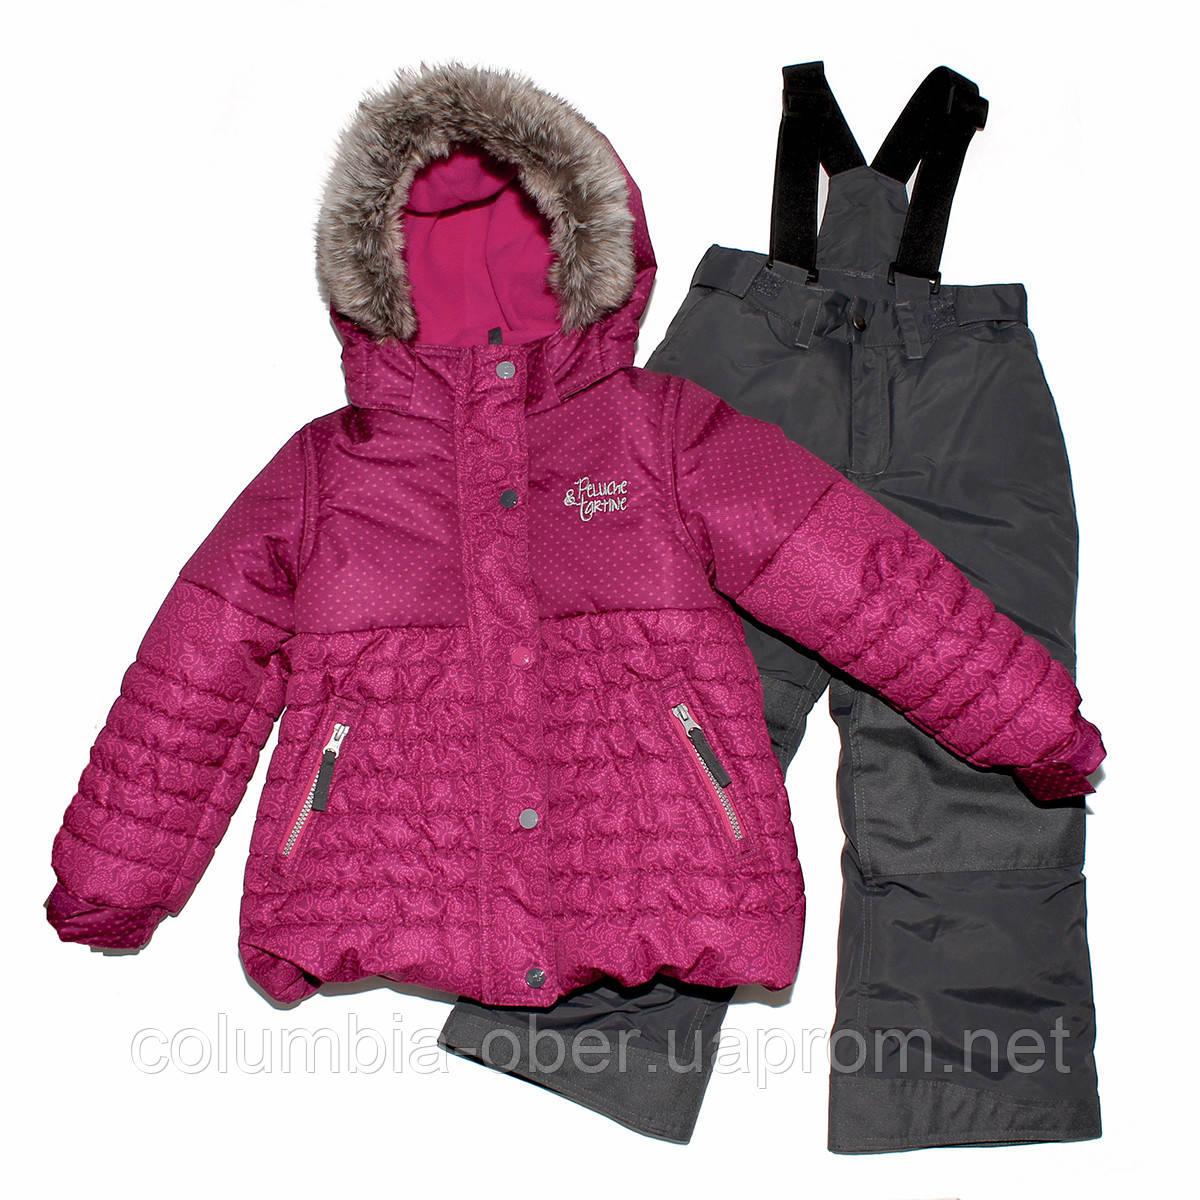 Зимний костюм для девочки PELUCHE F17 M 50 Framboise / Smokey Grey. Размеры 96 - 128.